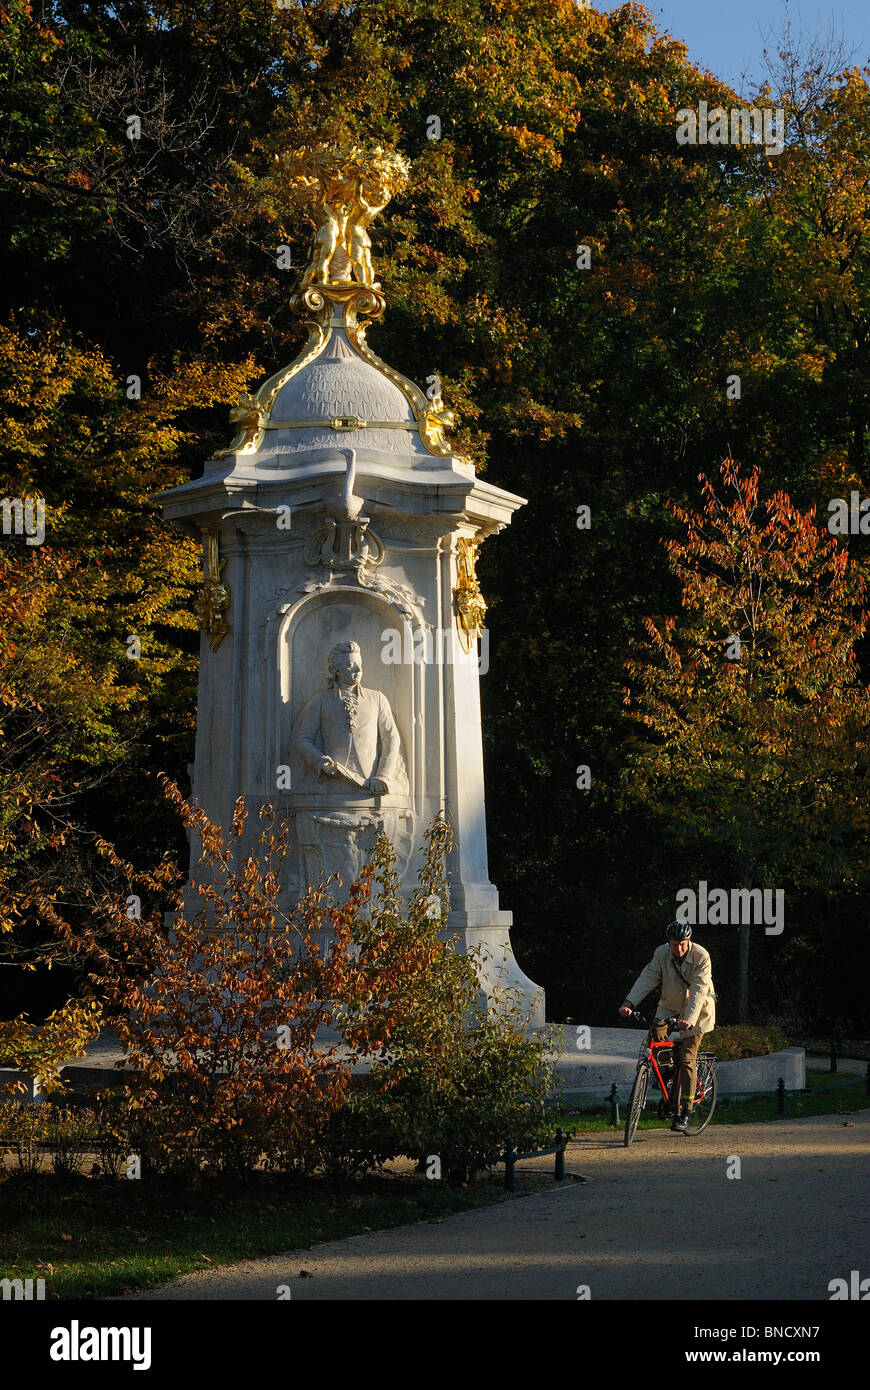 Beethoven-Haydn-Mozart-Denkmal, Komponistendenkmal composers memorial. Grosser Tiergarten park in fall, Berlin, - Stock Image